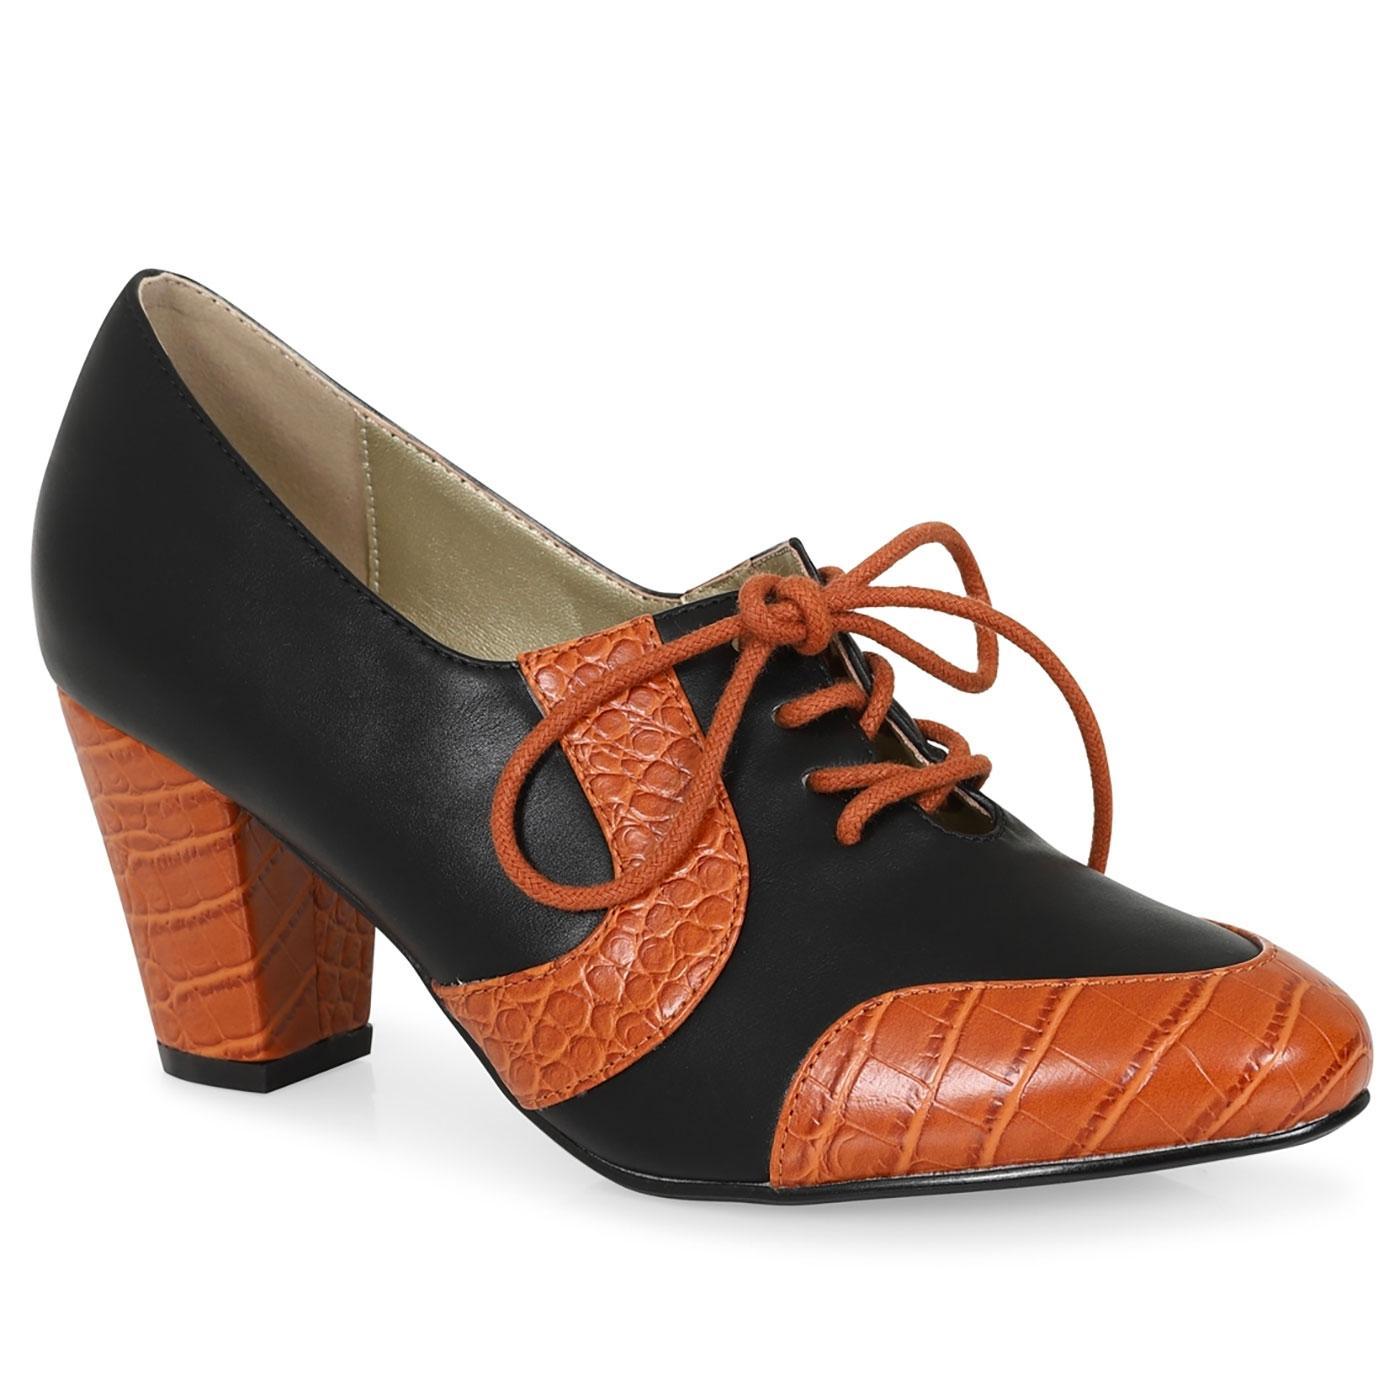 Agnes LULU HUN Retro Vintage 50s Shoes in Black